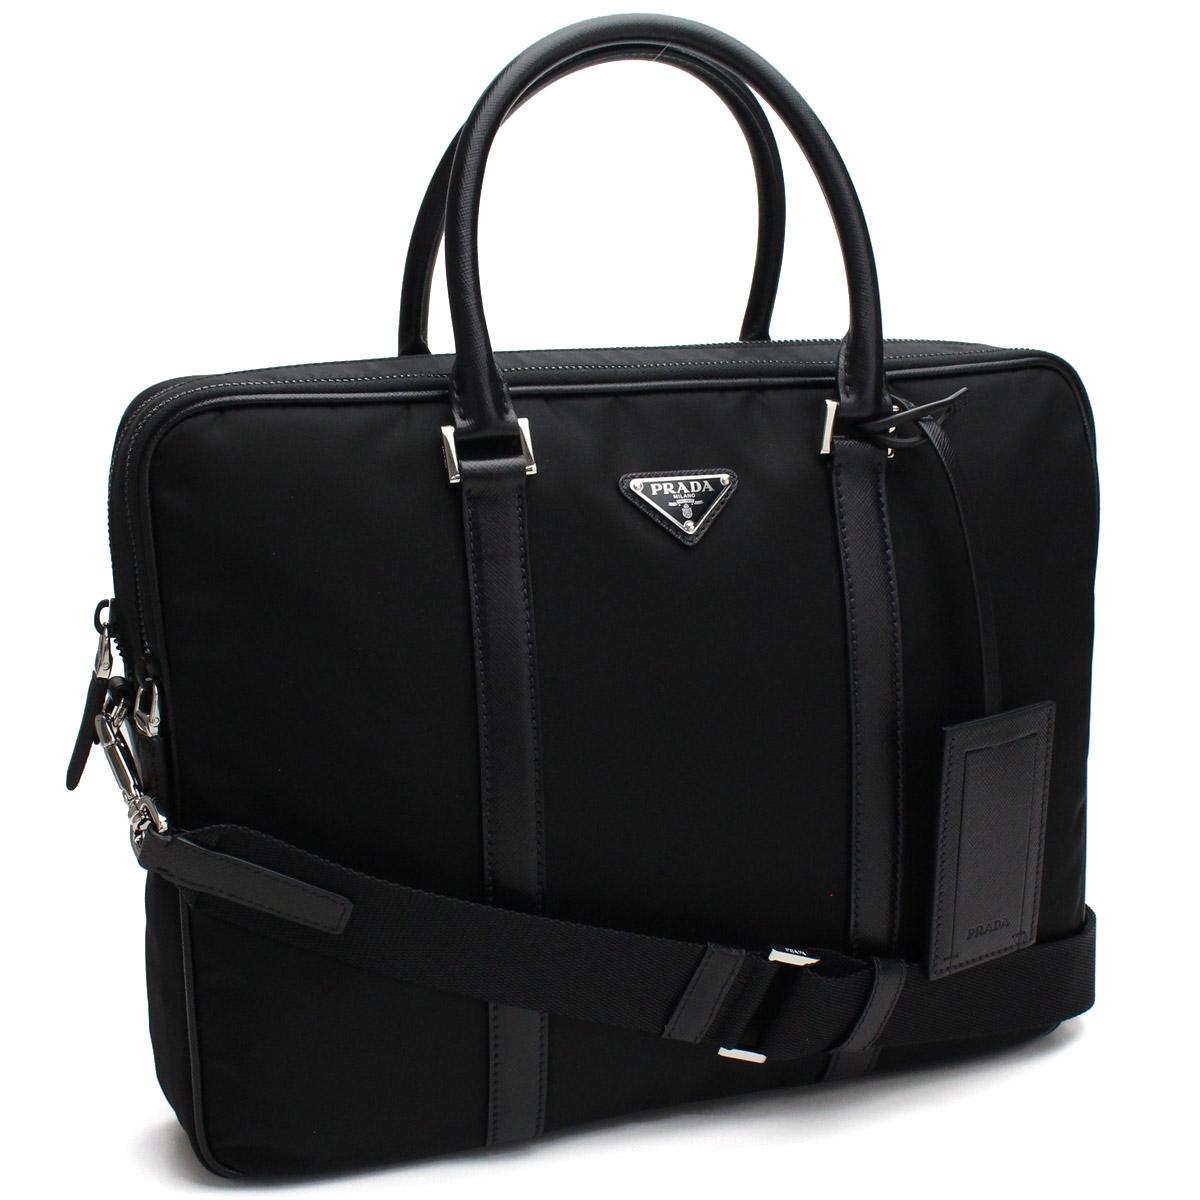 1deeba9e4d3af6 Bighit The total brand wholesale: Prada (PRADA) nylon briefcase business  bag 2VE002 064 VOOO F0002 NERO black   Rakuten Global Market